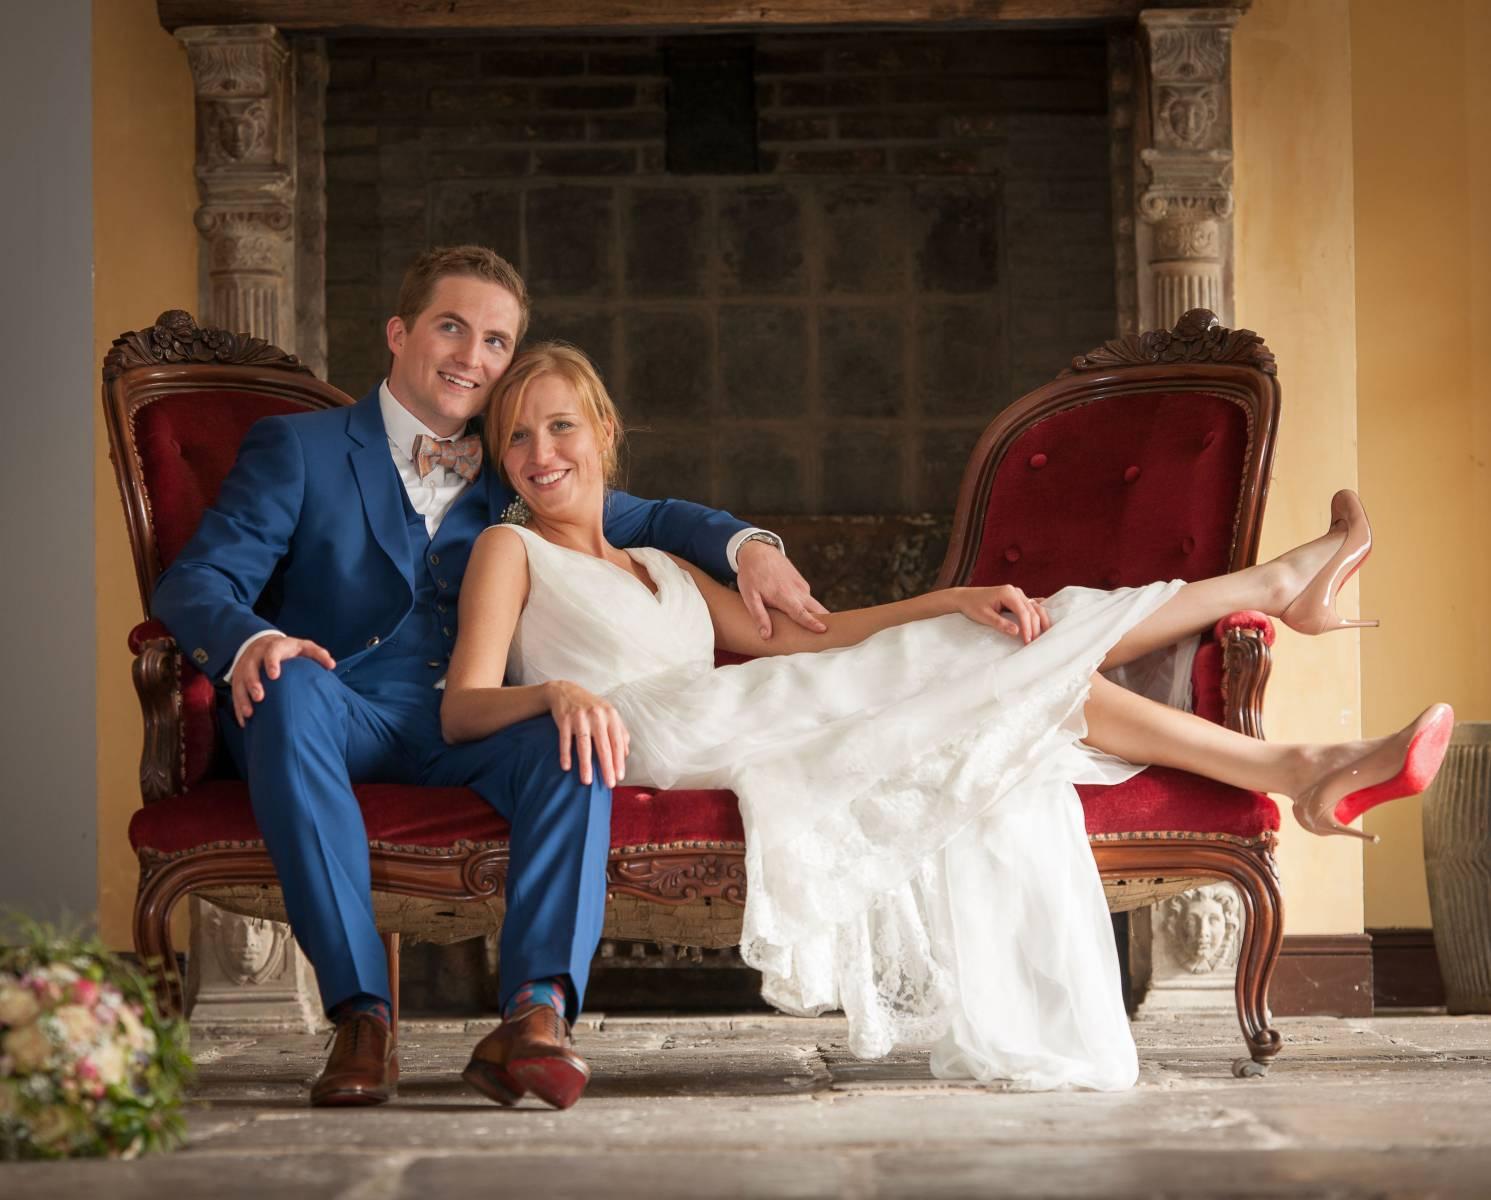 Foto Meeuw - House of Weddings - 16